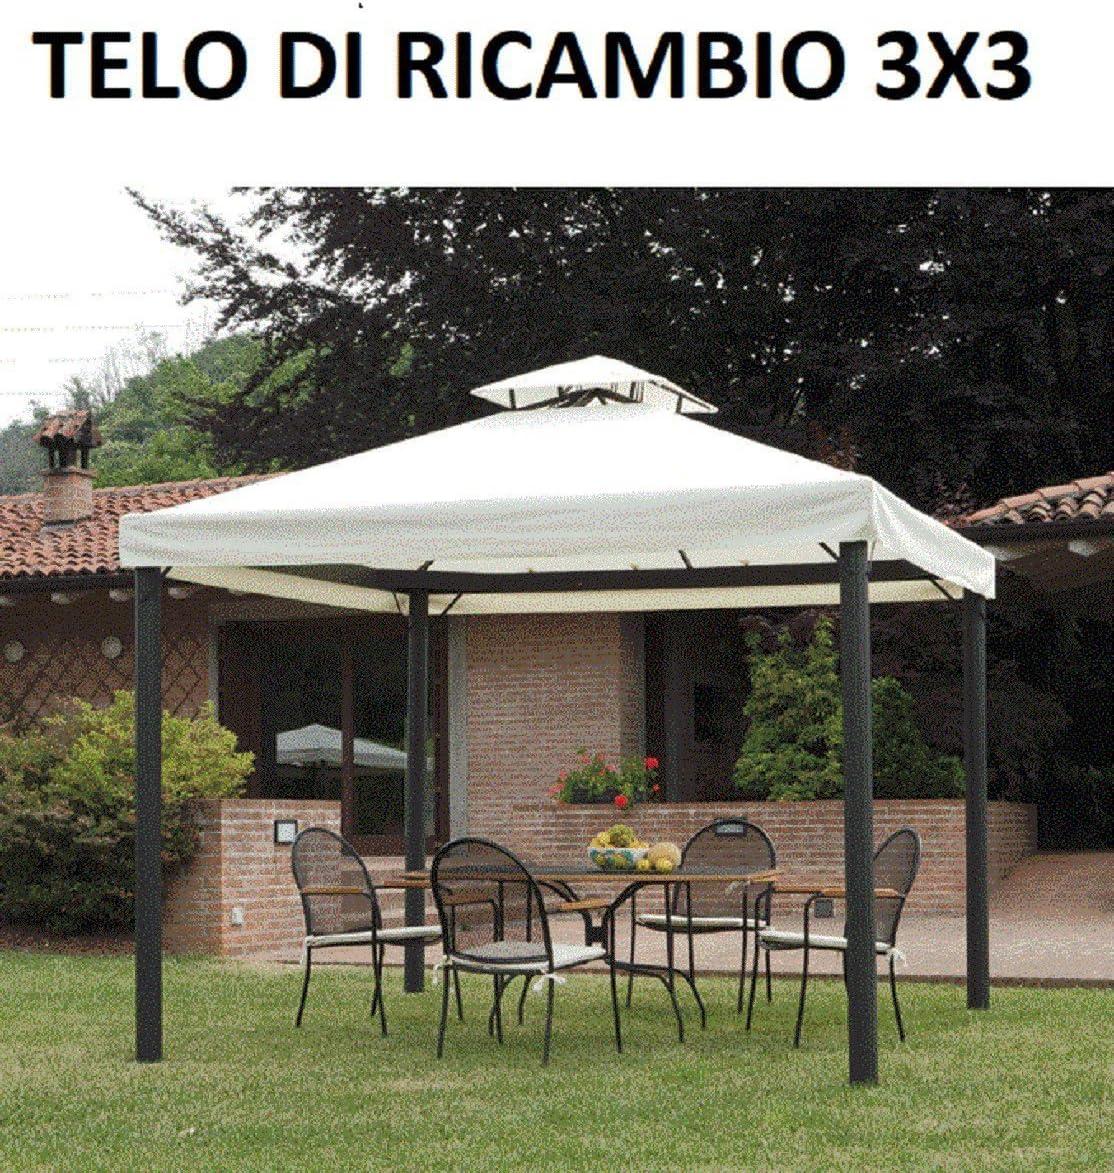 TELO BEIGE ECRU/' DI RICAMBIO CON AIR VENT PER GAZEBO MT.3X3 GAZEBI GIARDINO